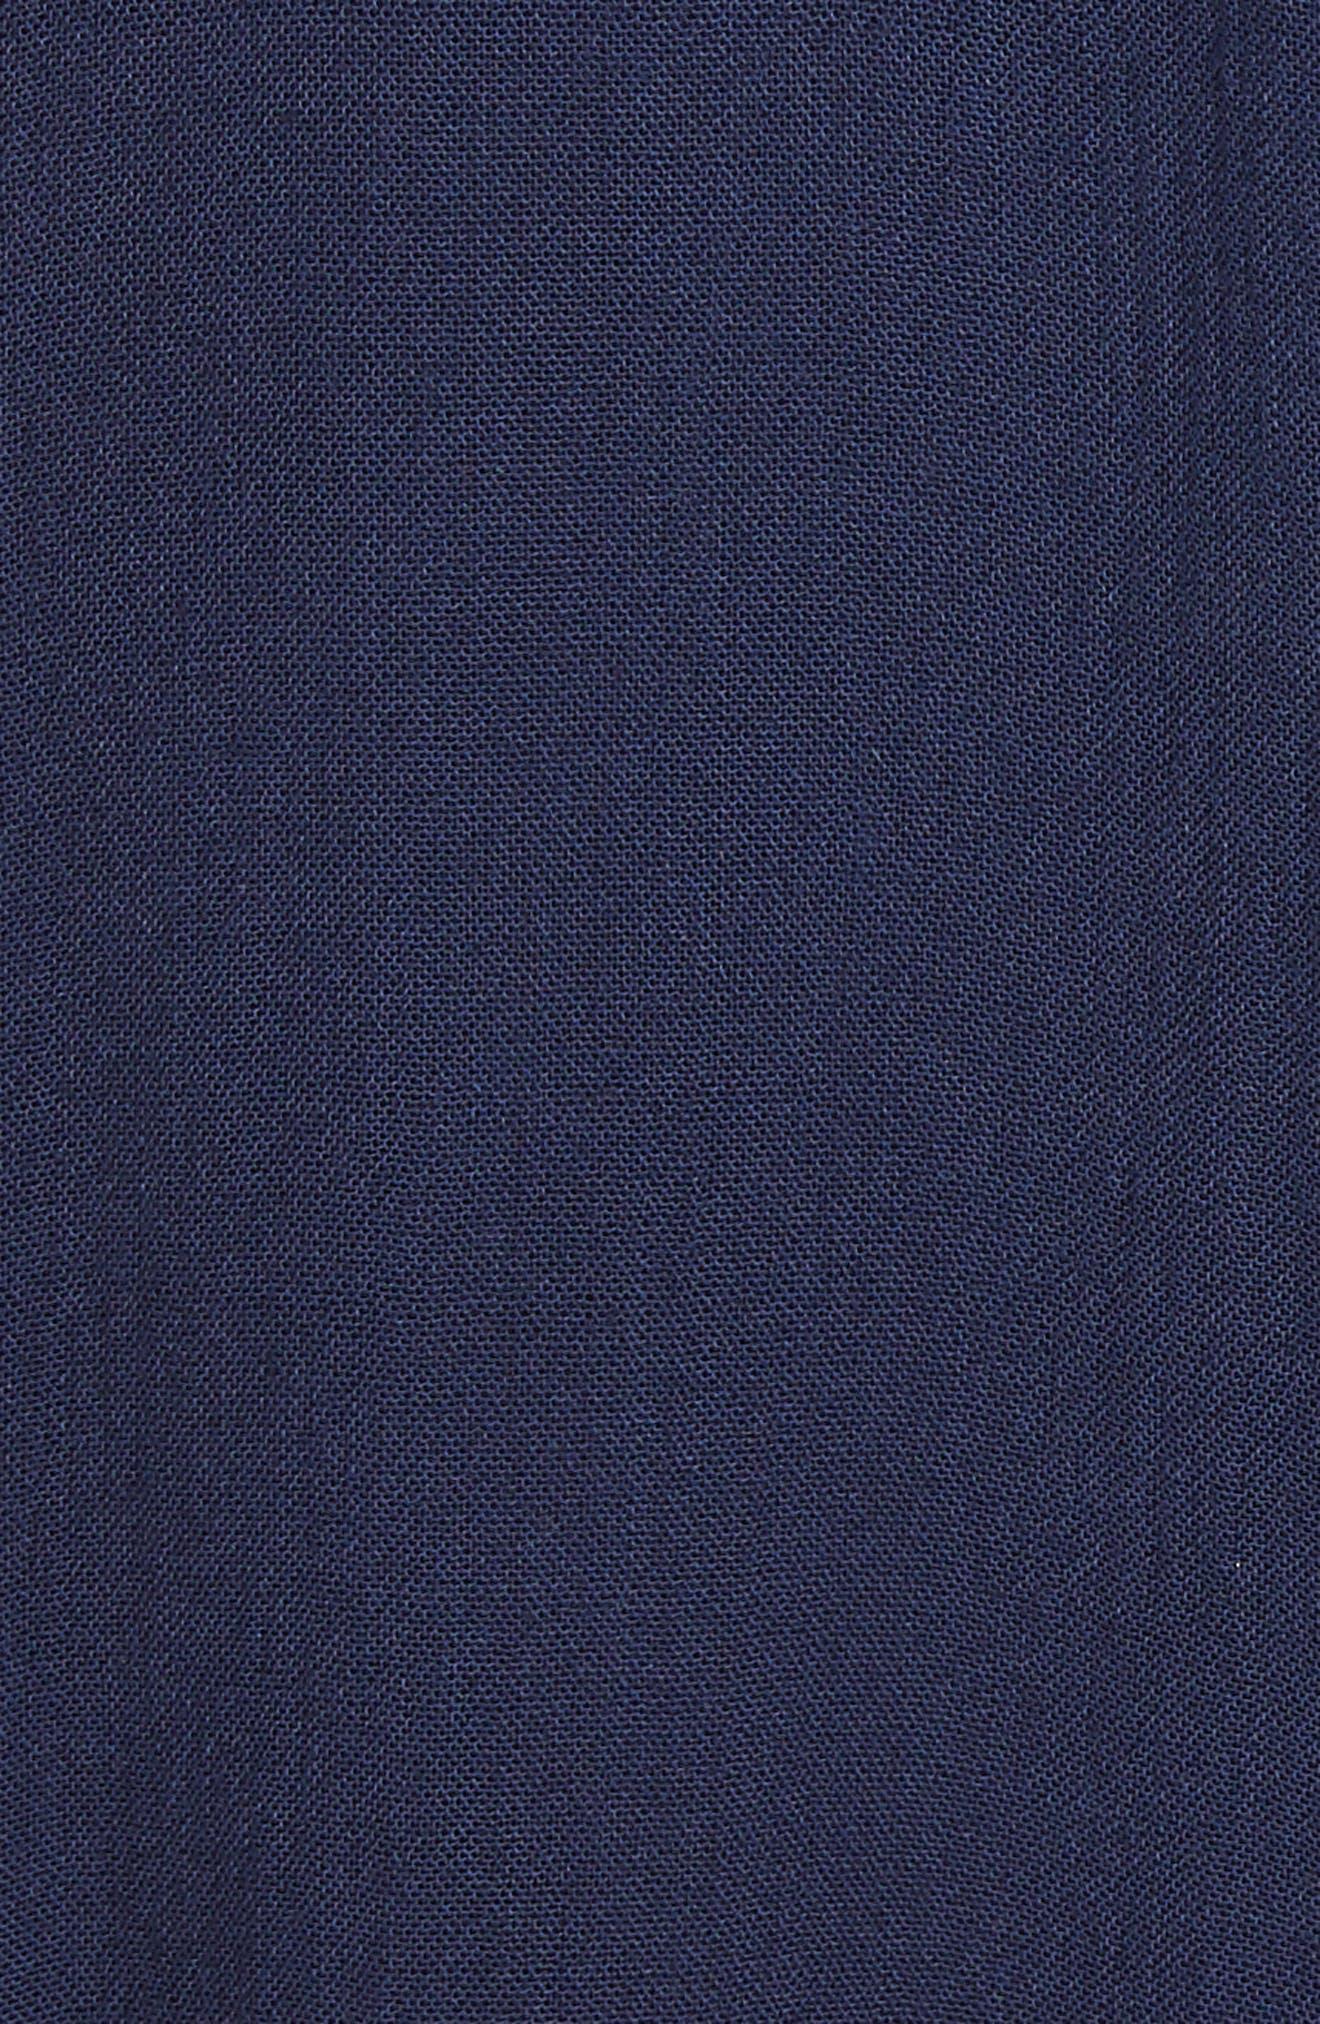 Priscilla Minidress,                             Alternate thumbnail 6, color,                             Navy